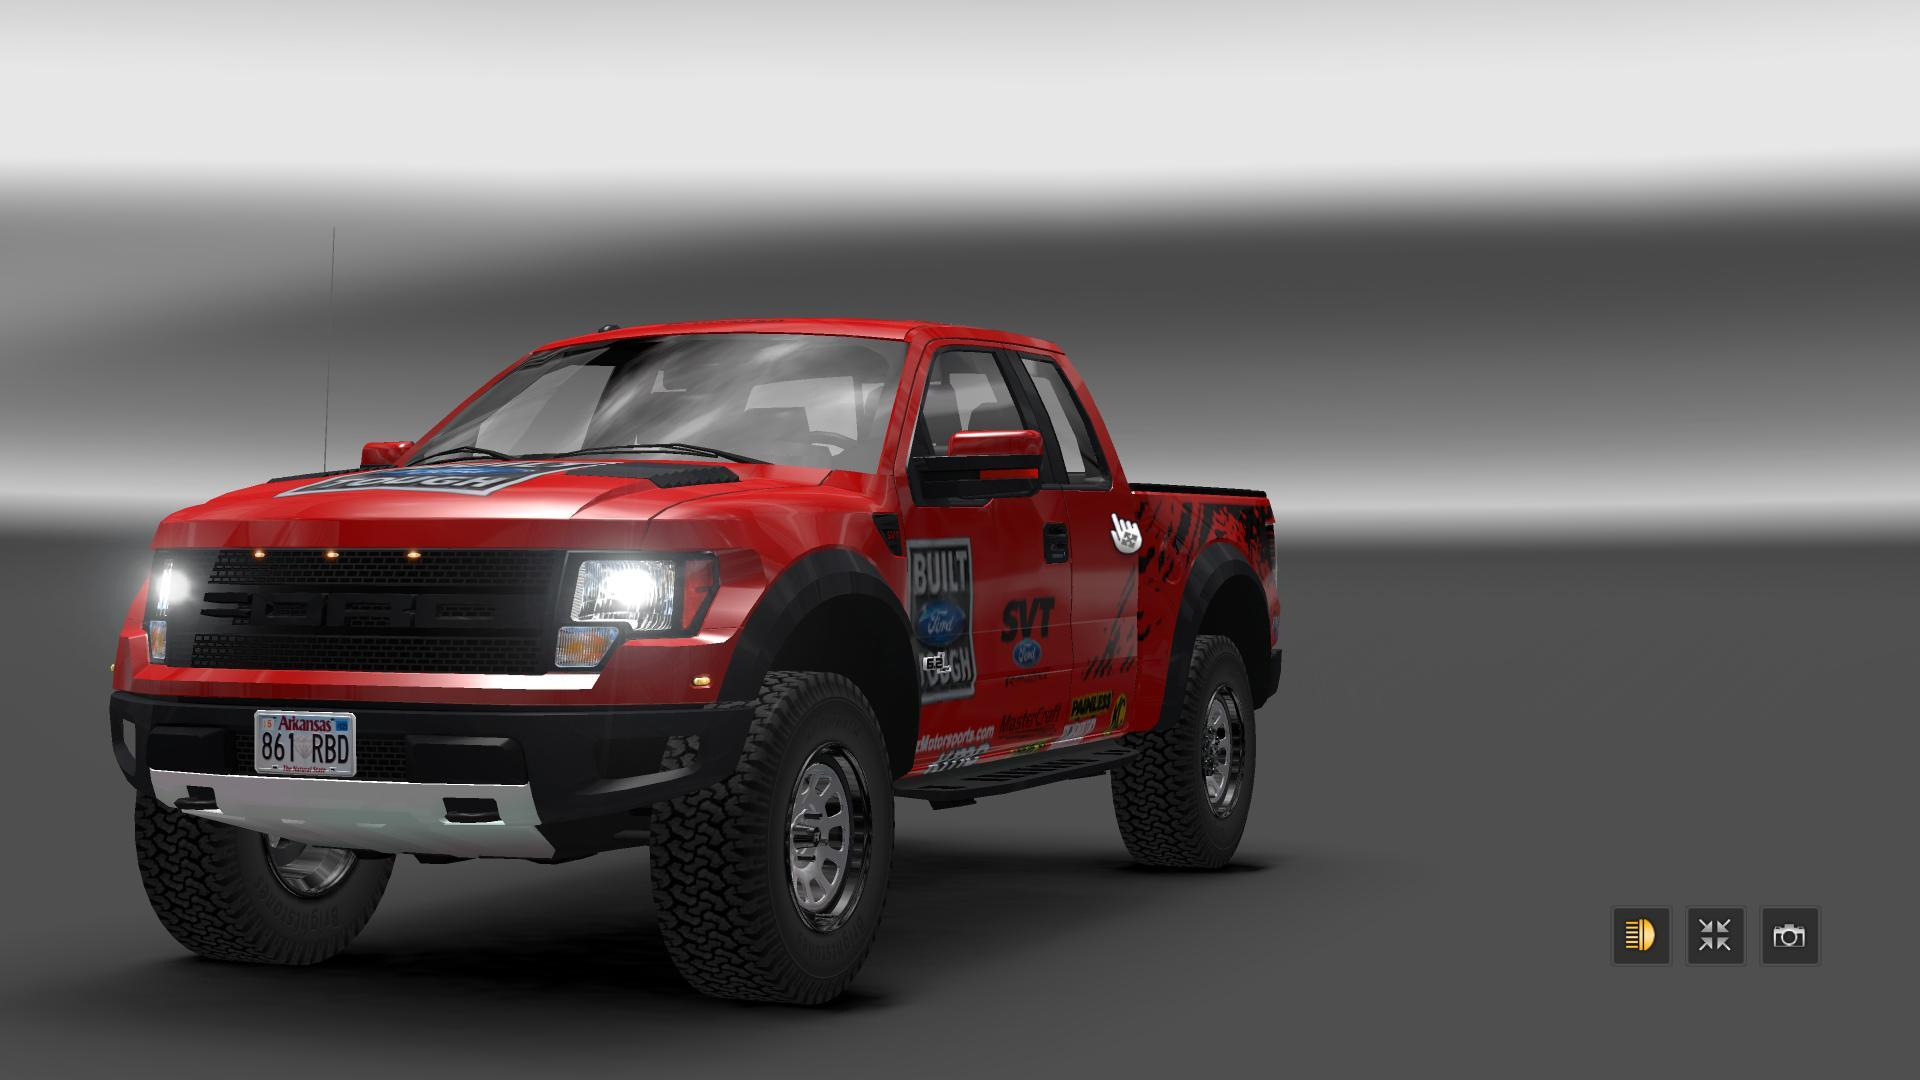 Accesorios Para Trocas Ford F150 >> Accesorios Para Trocas | Update Cars For 2020